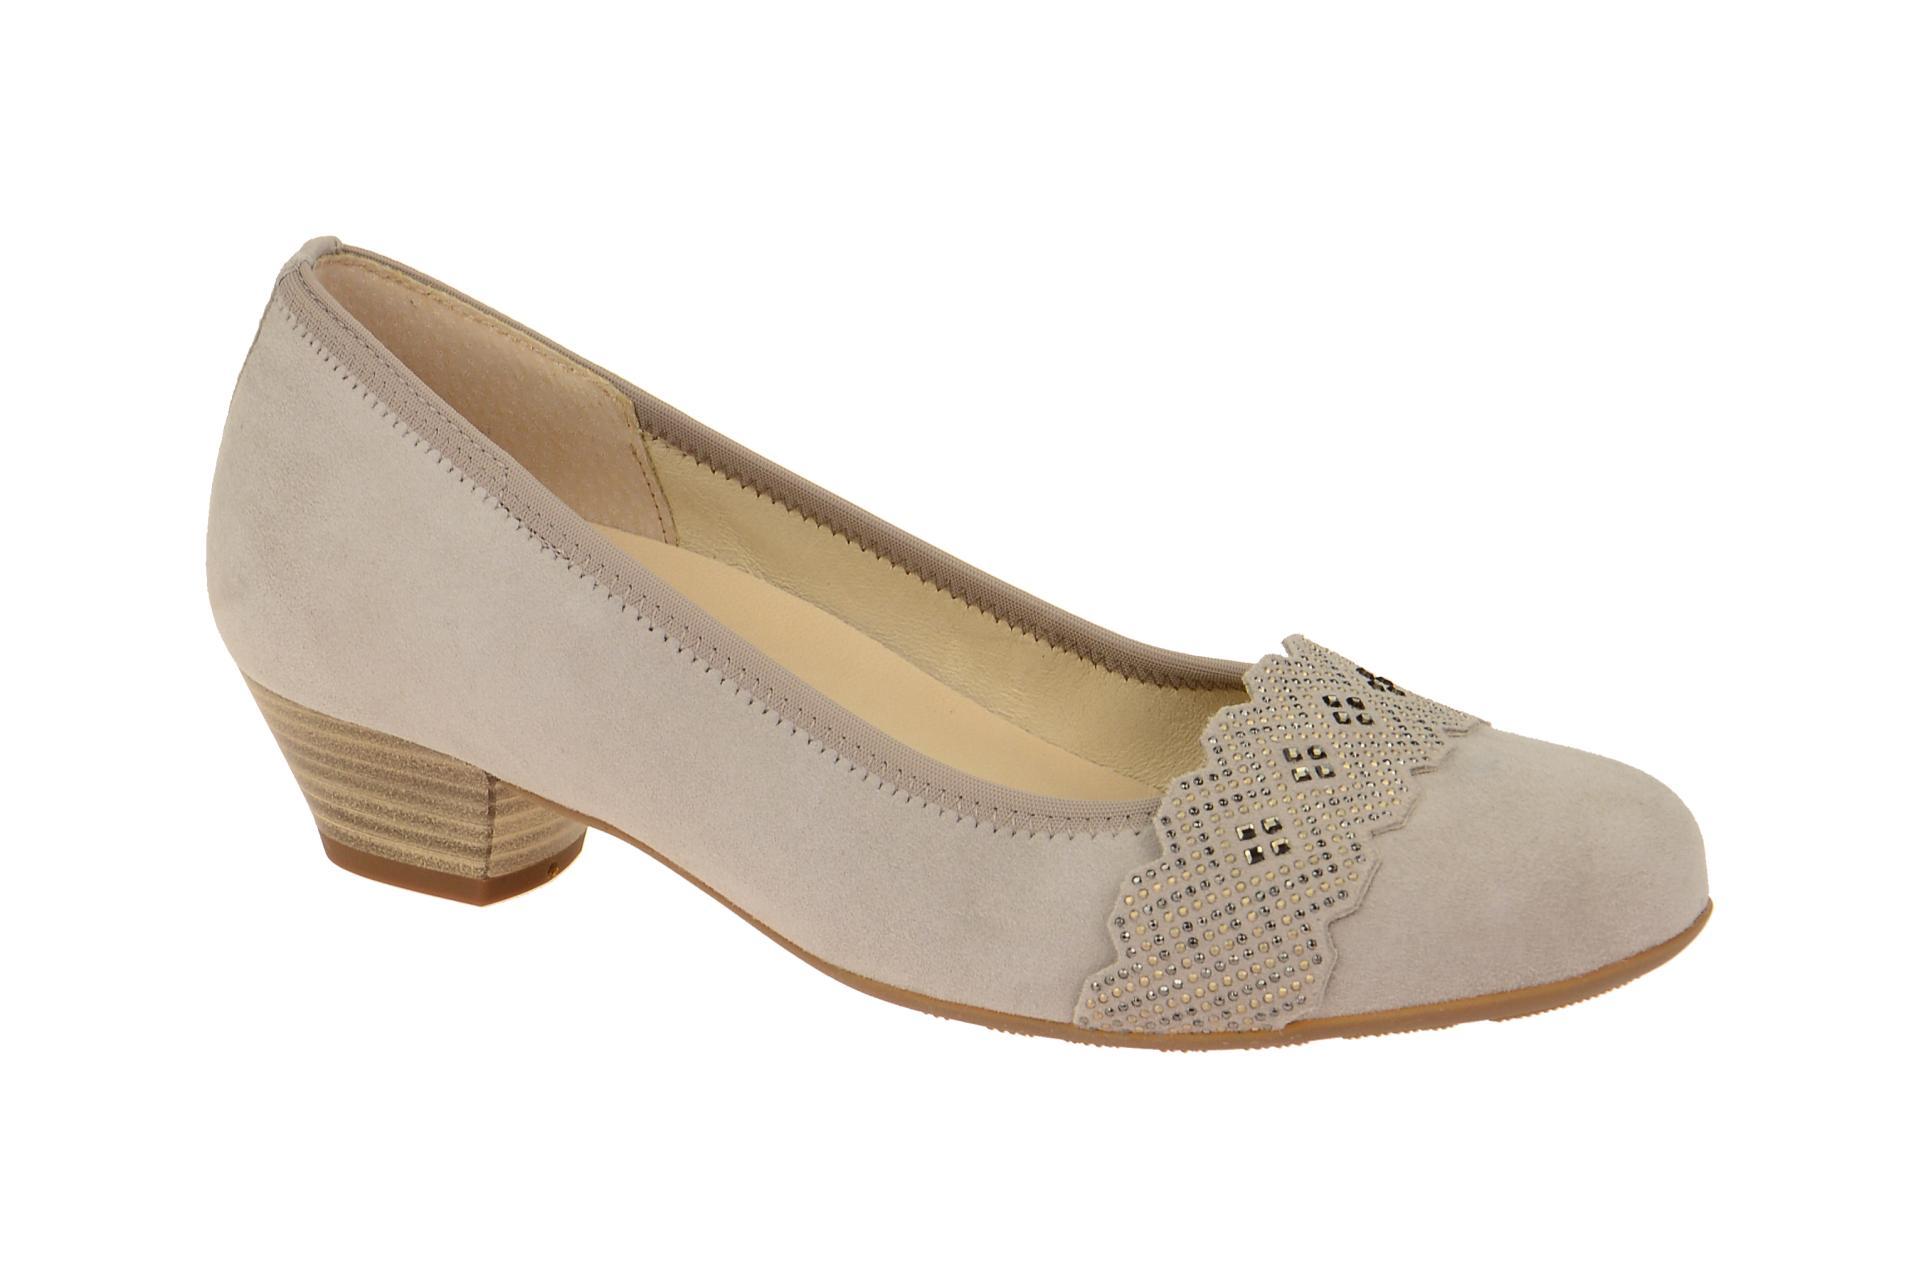 new styles 8fb58 a2b3b Details zu Gabor Schuhe MALTA grau Damenschuhe Pumps 66.134.44 NEU